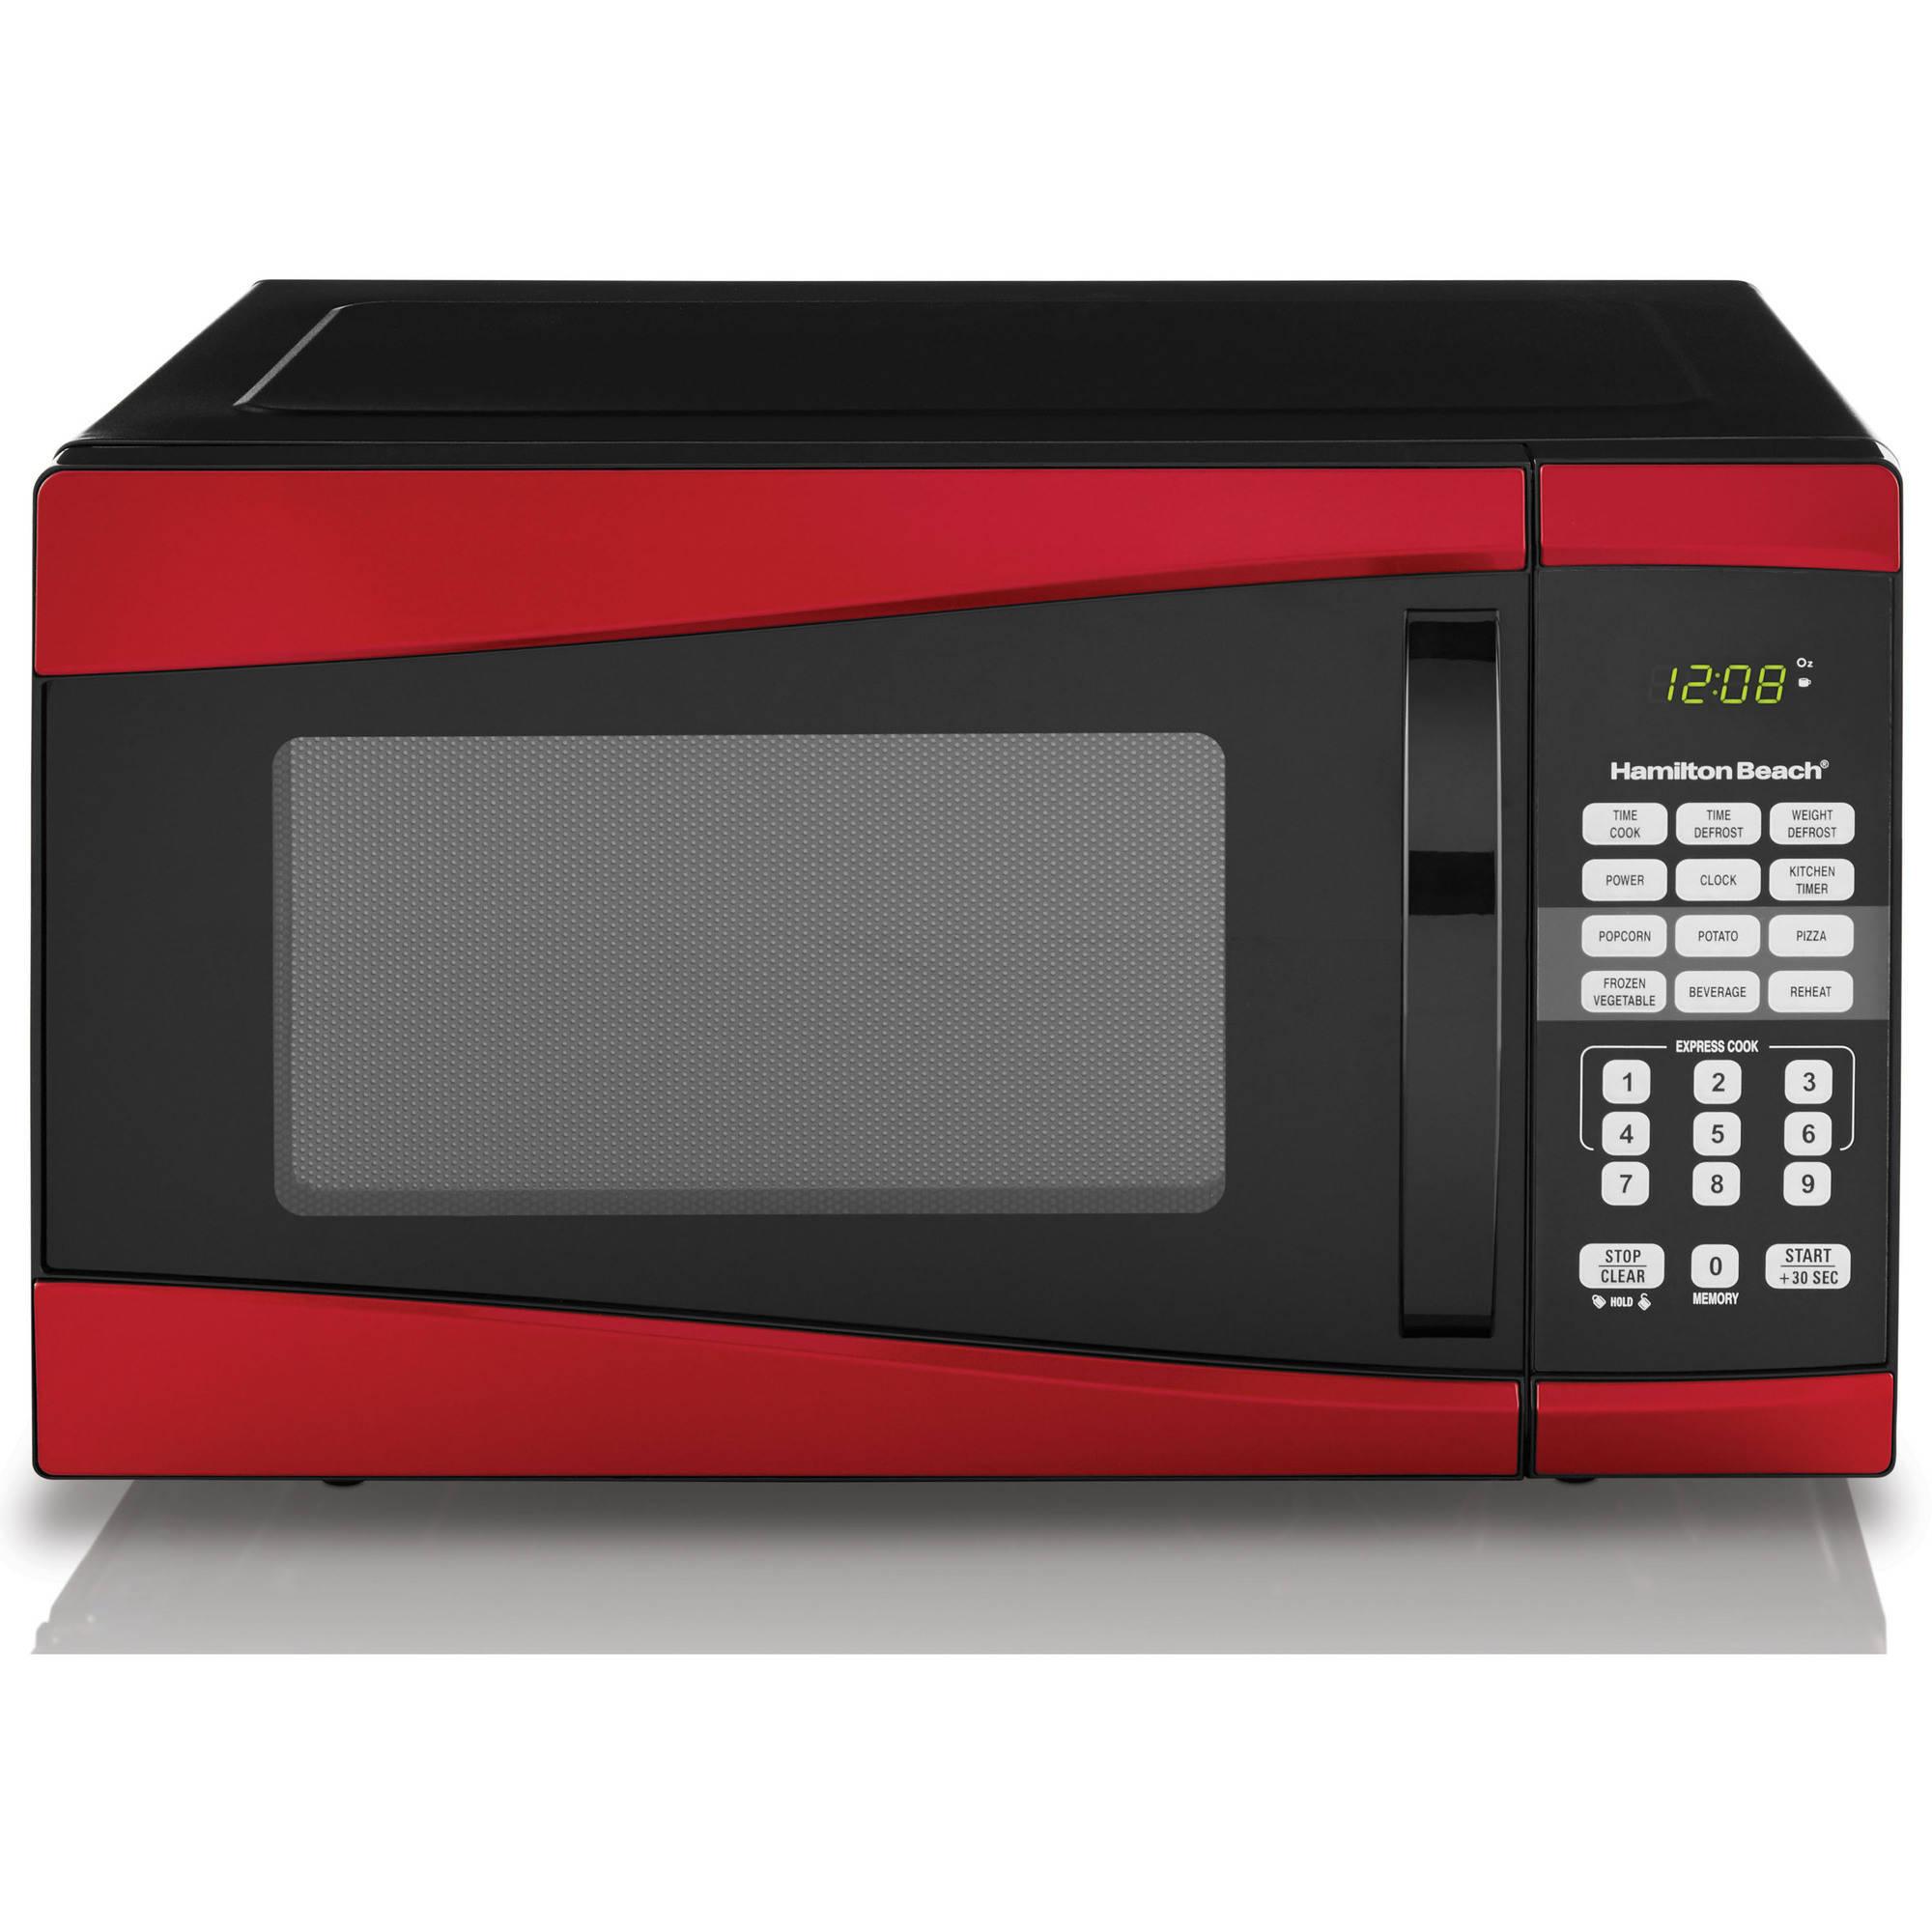 Hamilton Beach 0.9 Cu. Ft. 900W Microwave, Red